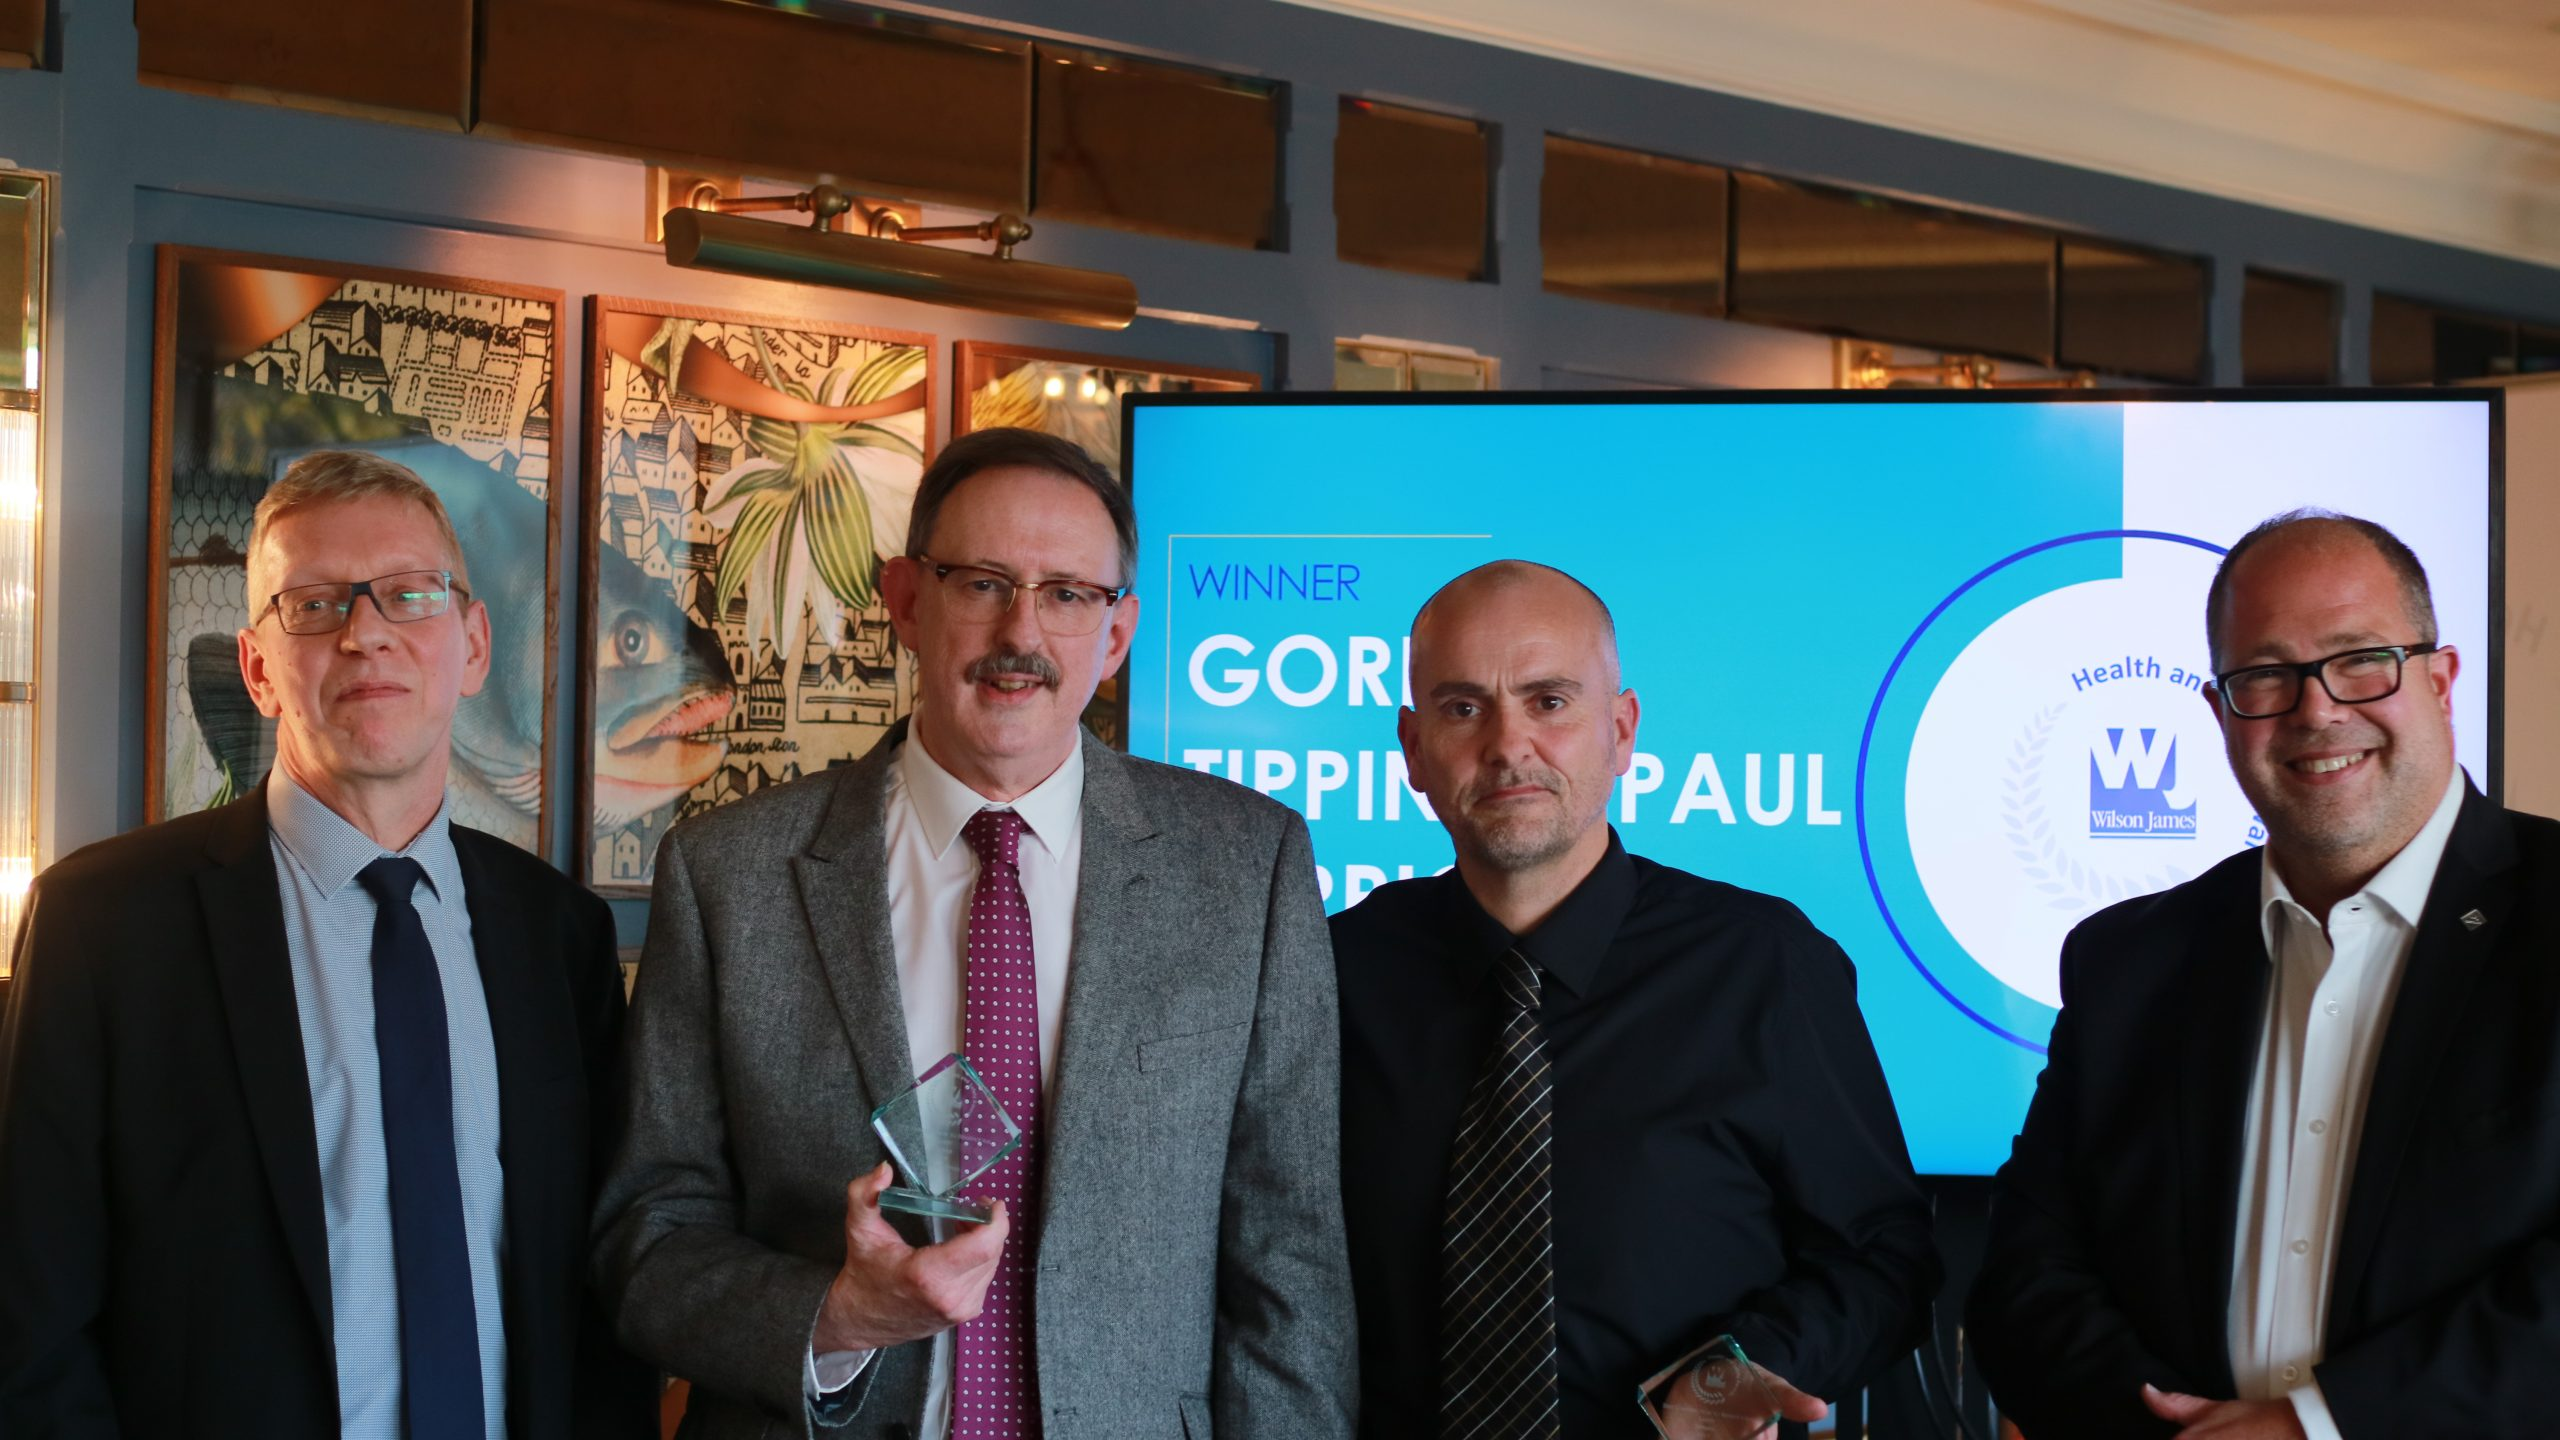 BEST CONTRIBUTION TO BEHAVIOURAL SAFETY: GORDON TIPPINS & PAUL BERRIGAN